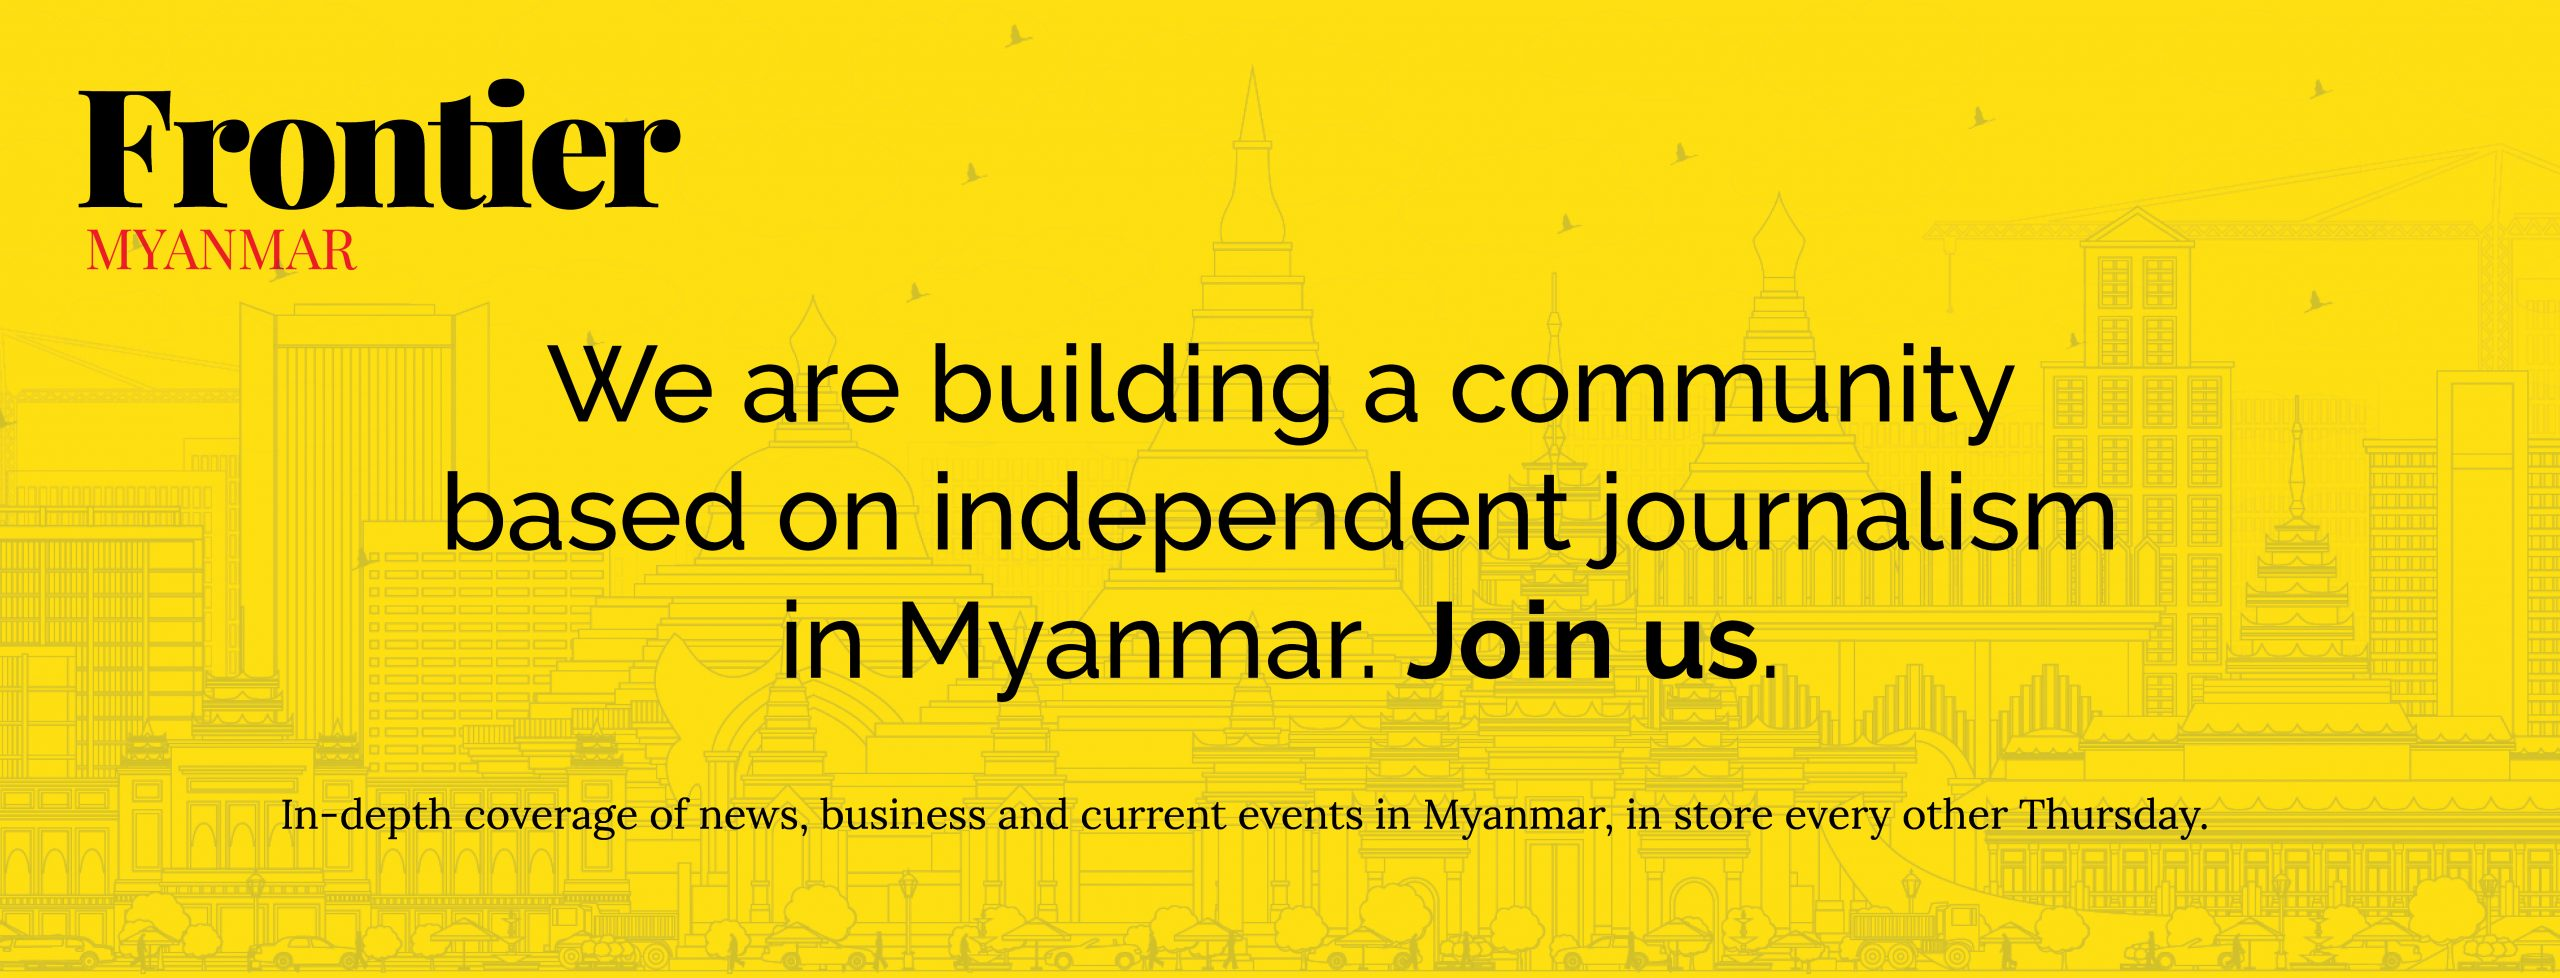 Frontier Myanmar Membership Cover Photo for Facebook